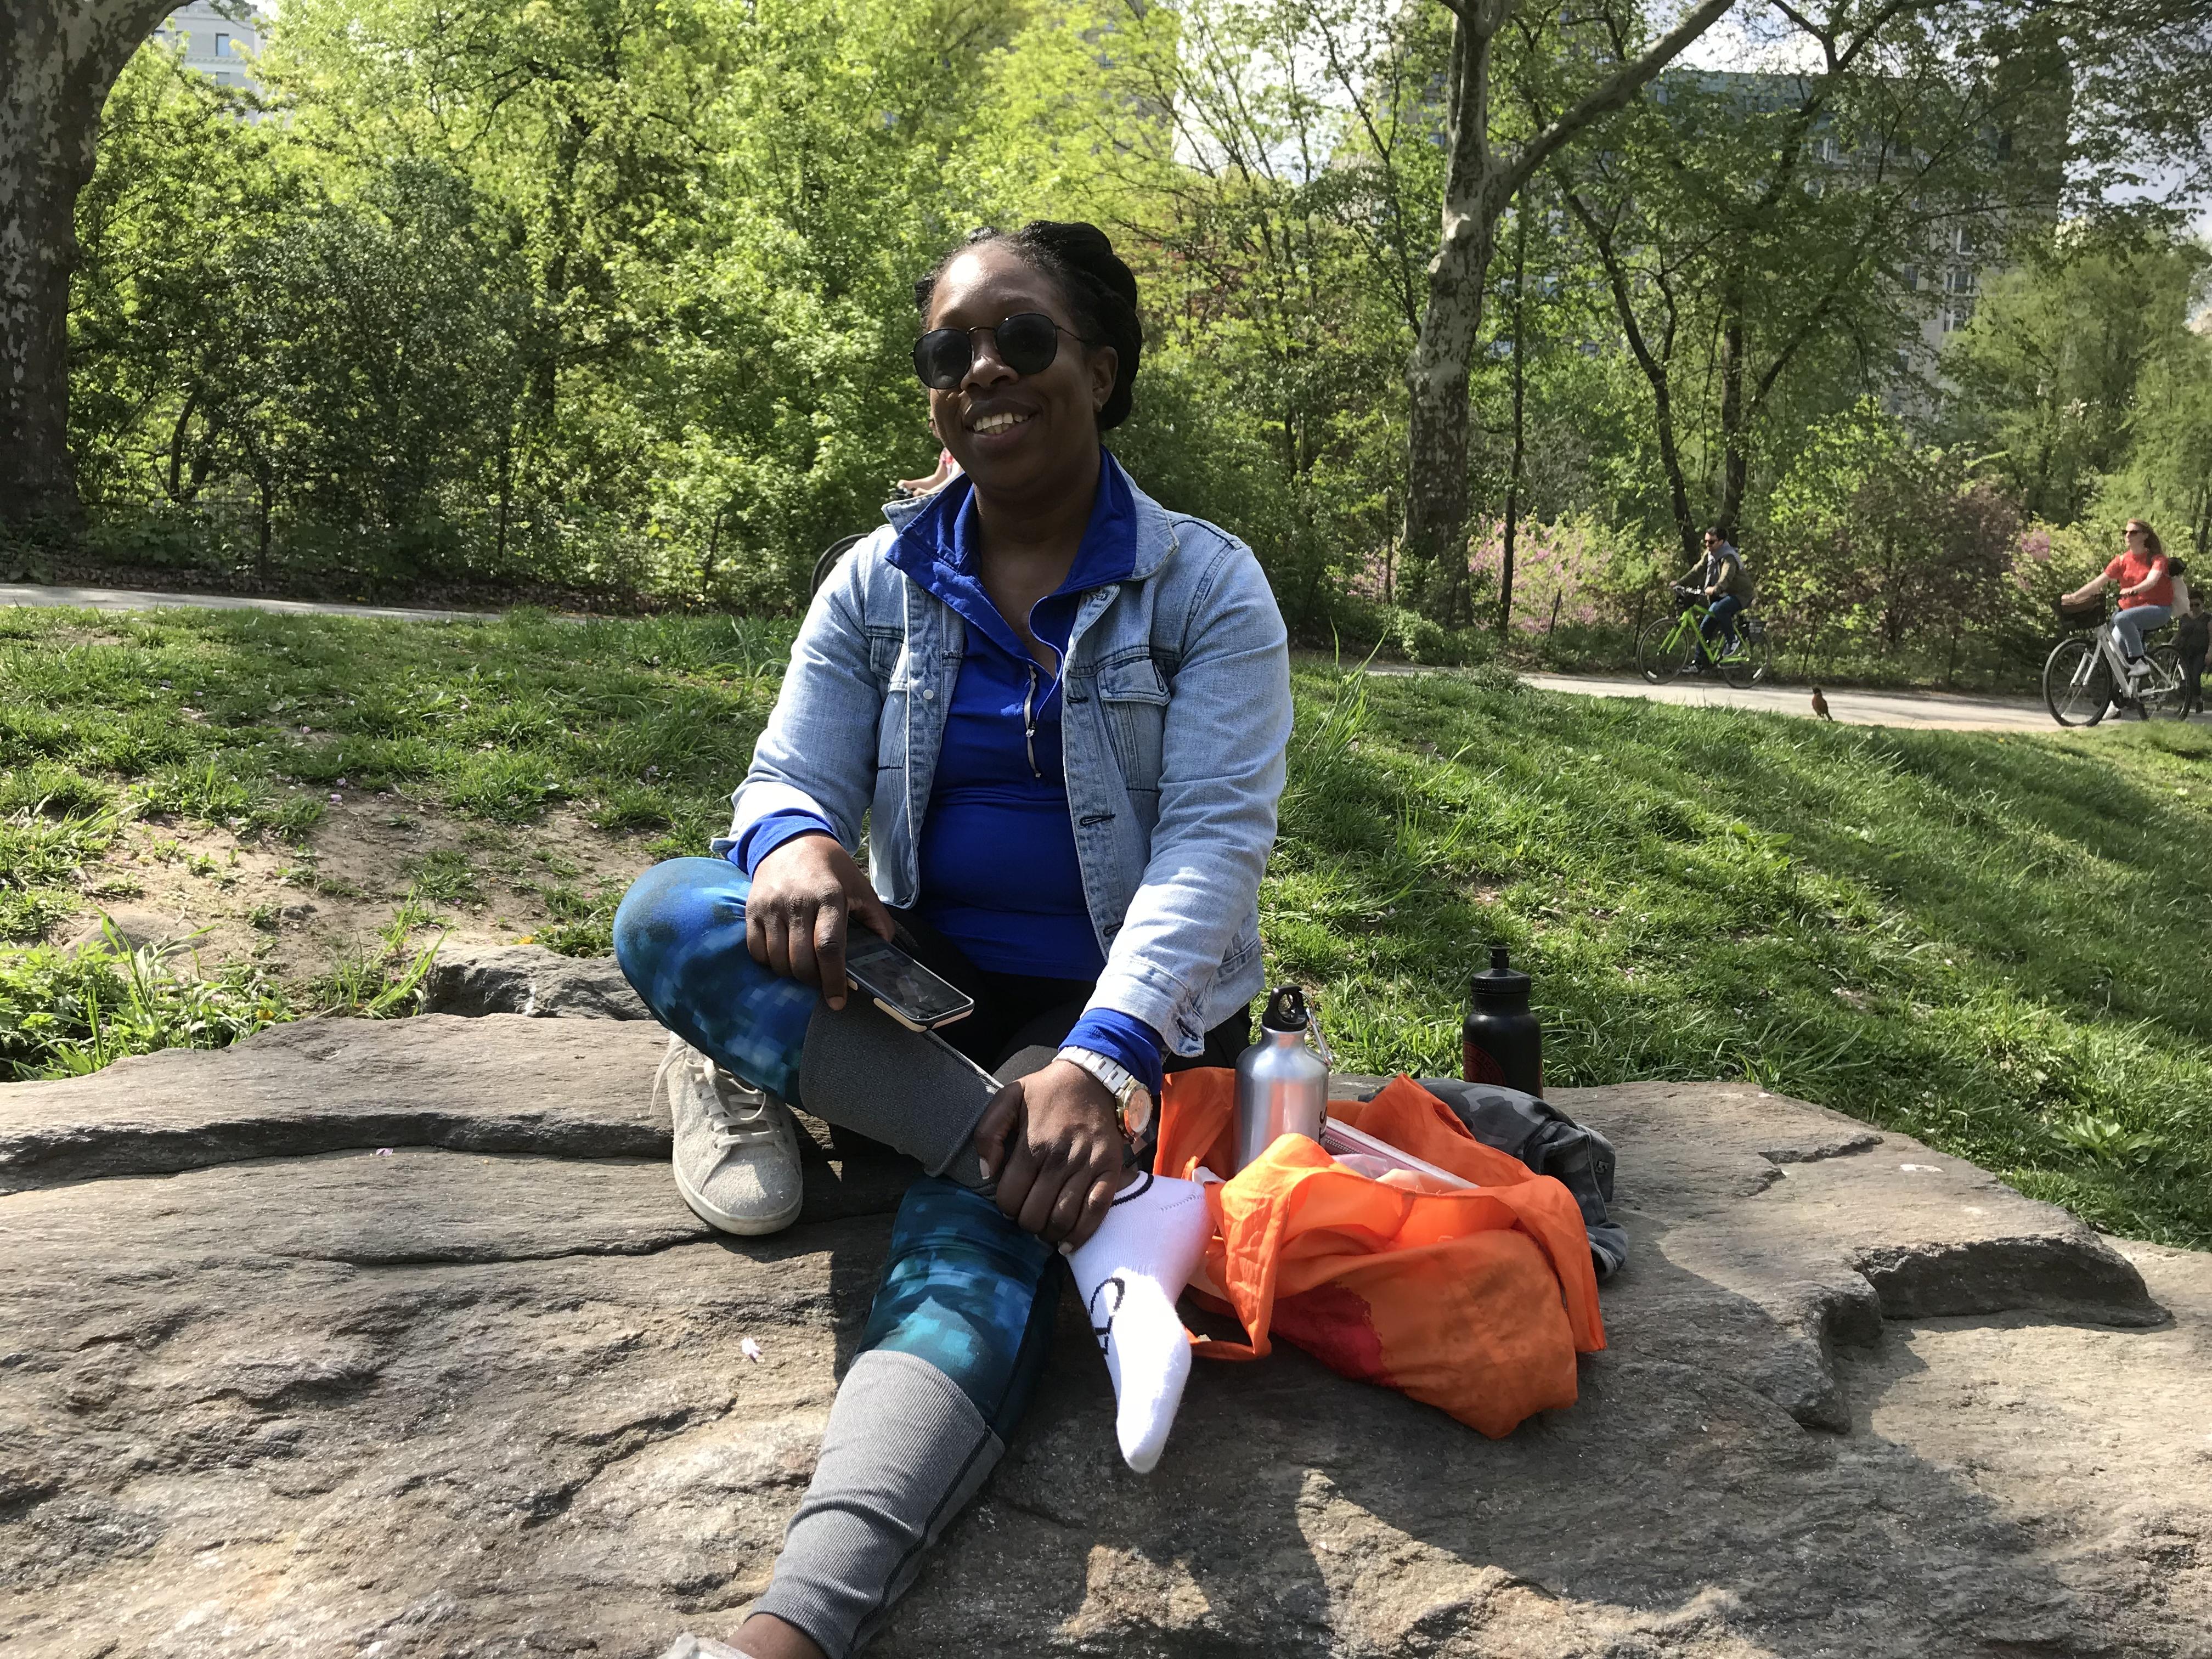 Deon, Childcare, Central Park